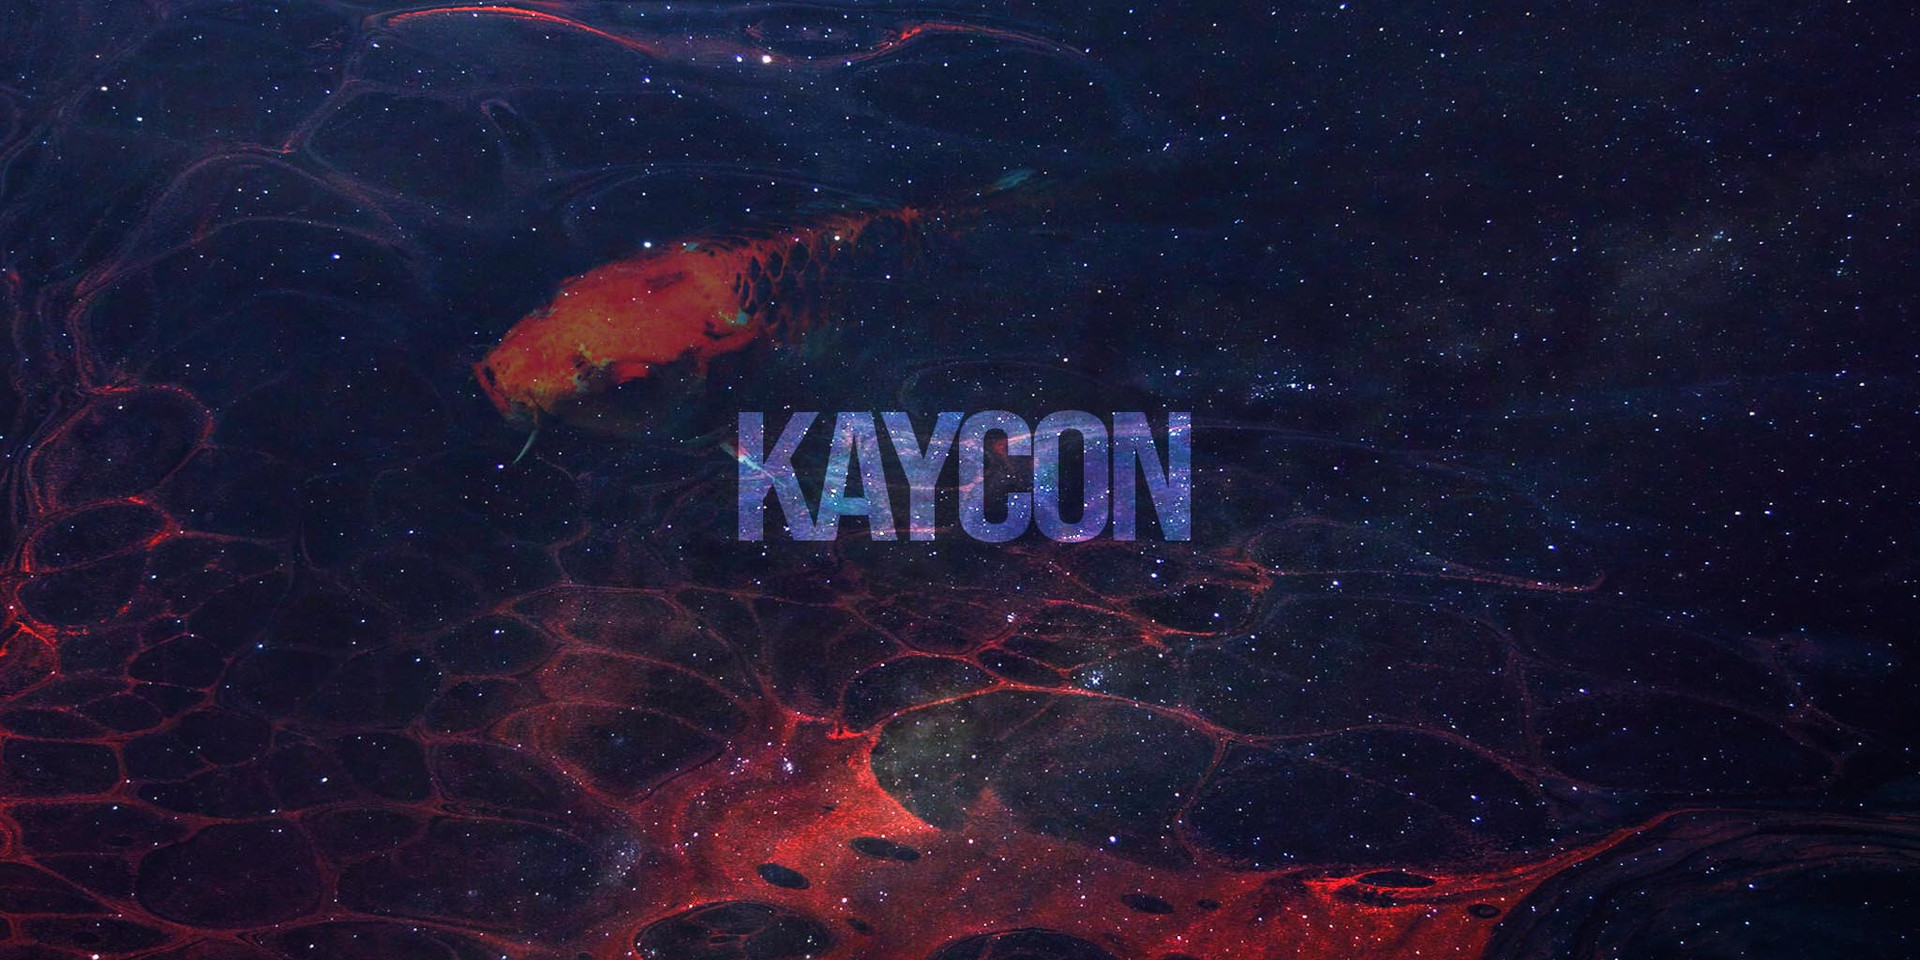 Youtube Banner_KAYCON.jpg